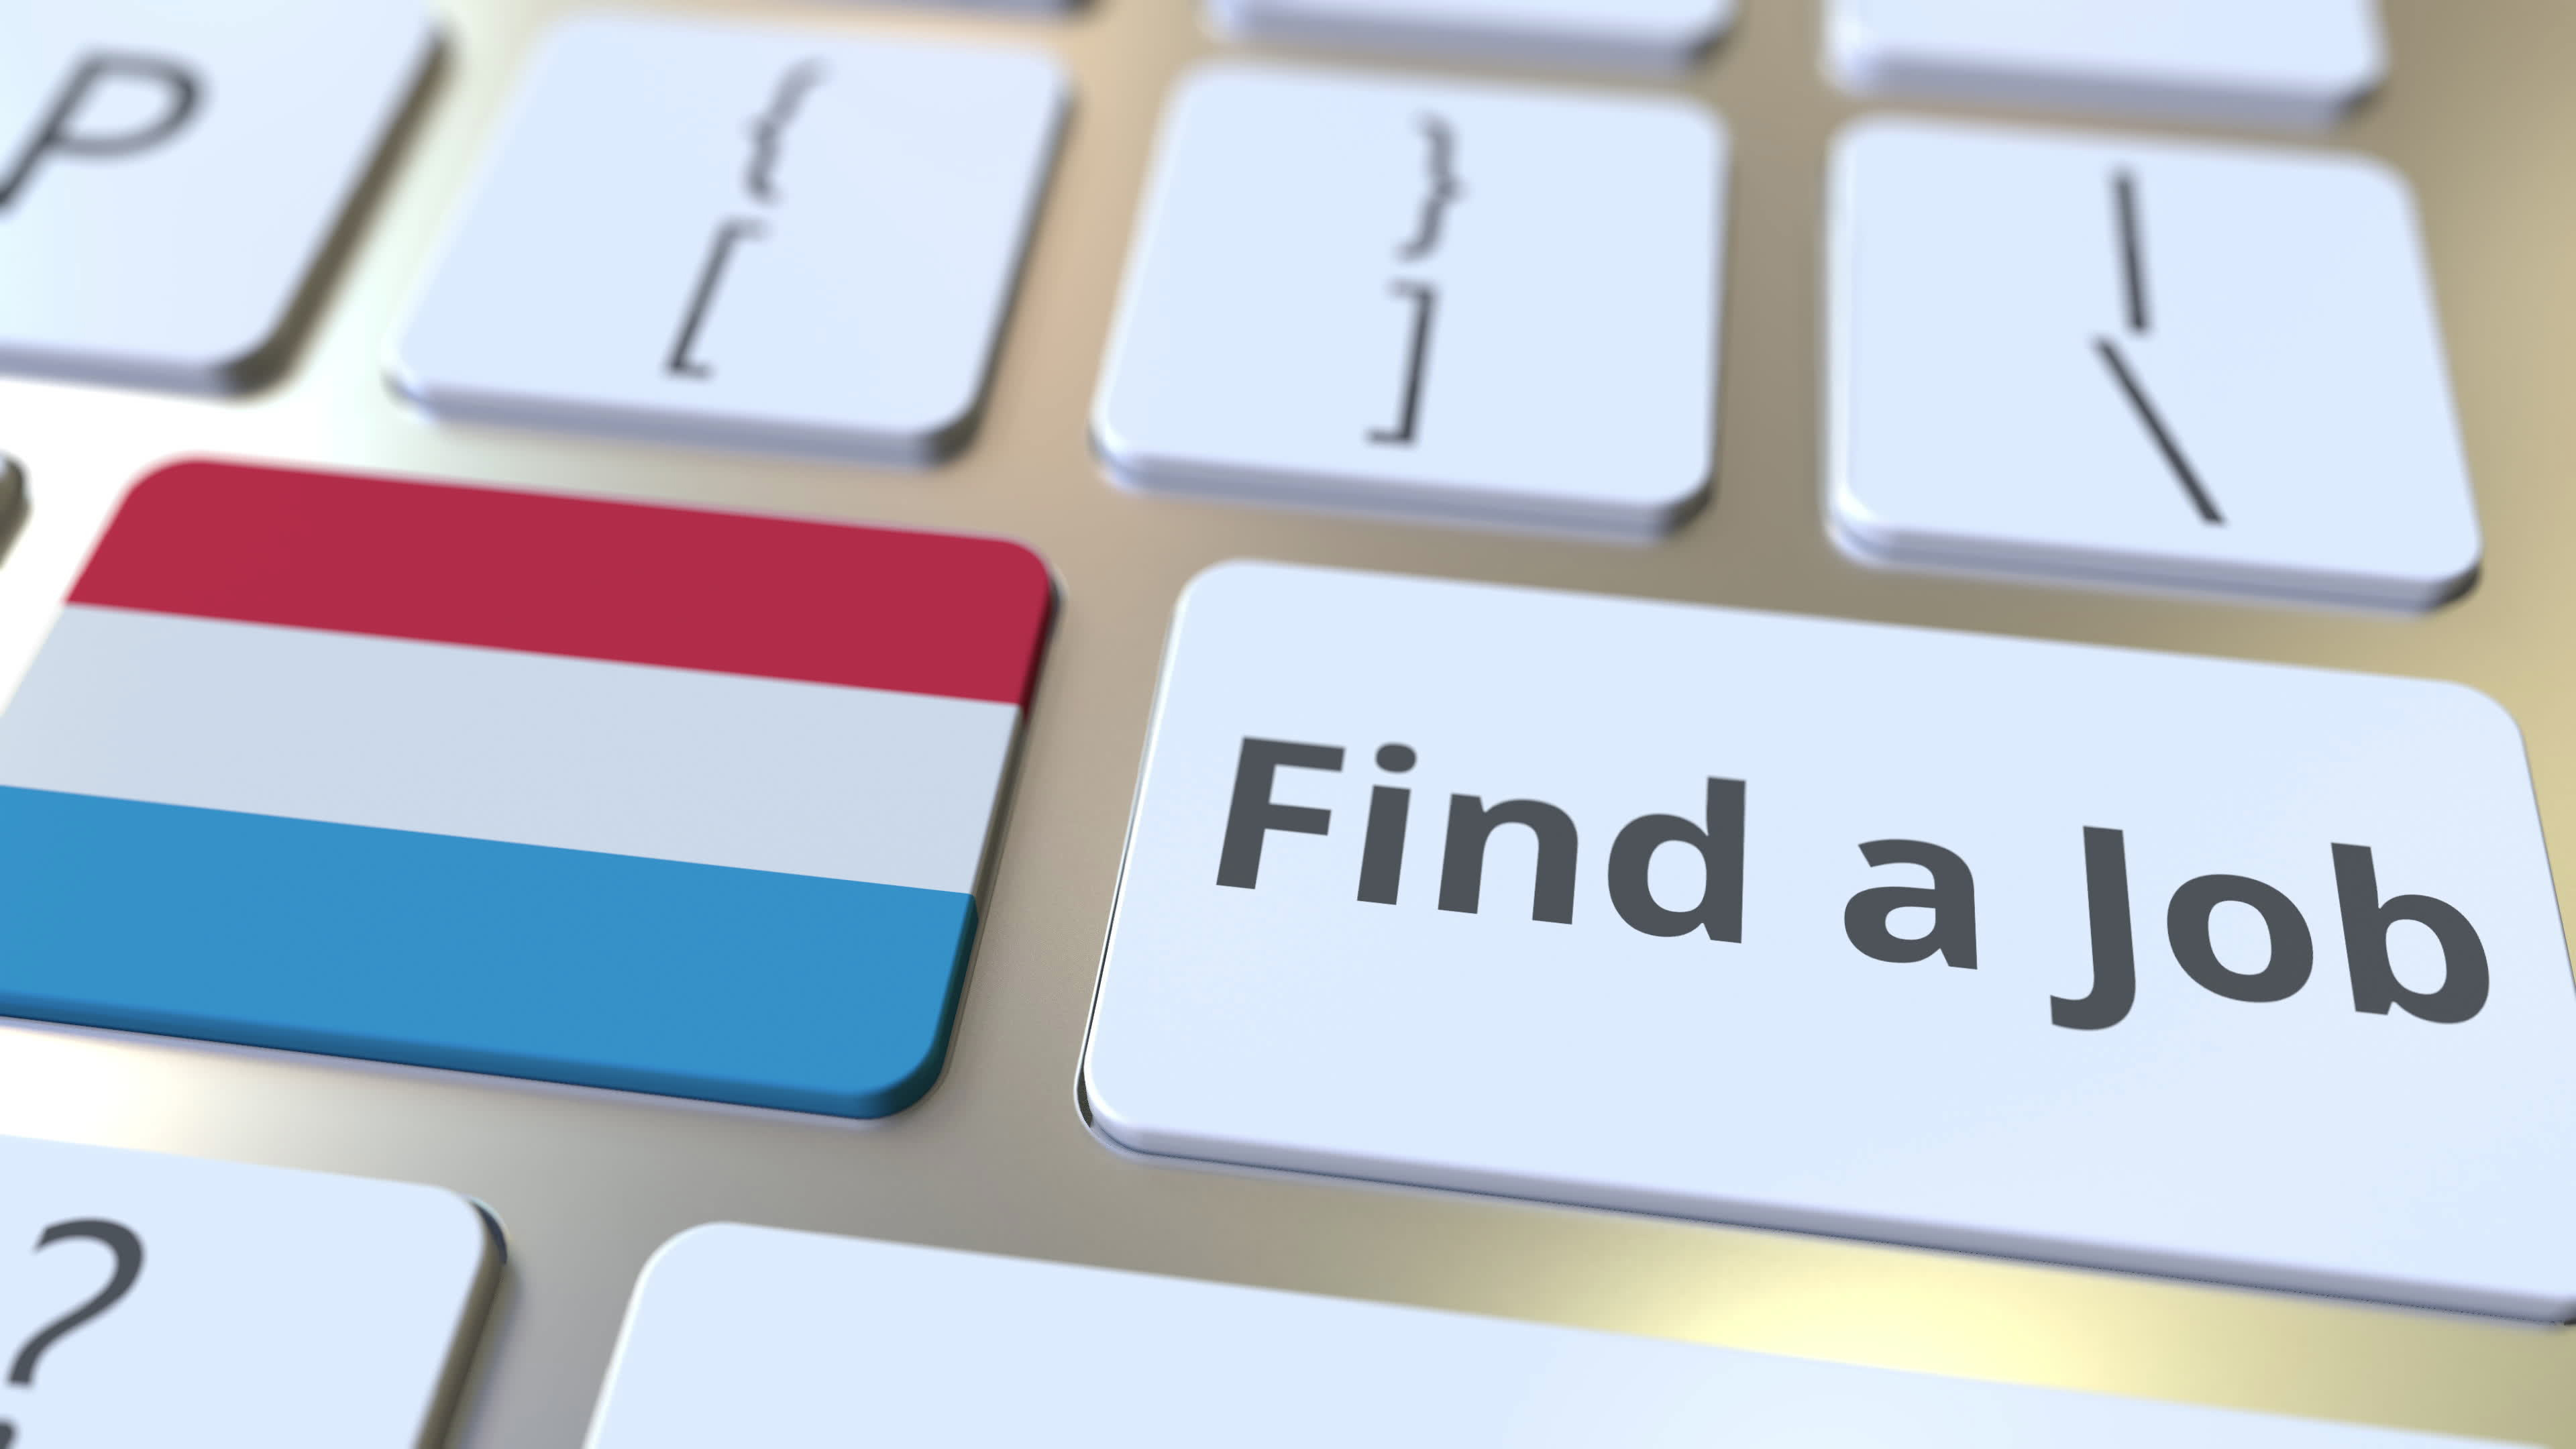 Концепция трудоустройства в Люксембурге для граждан РФ